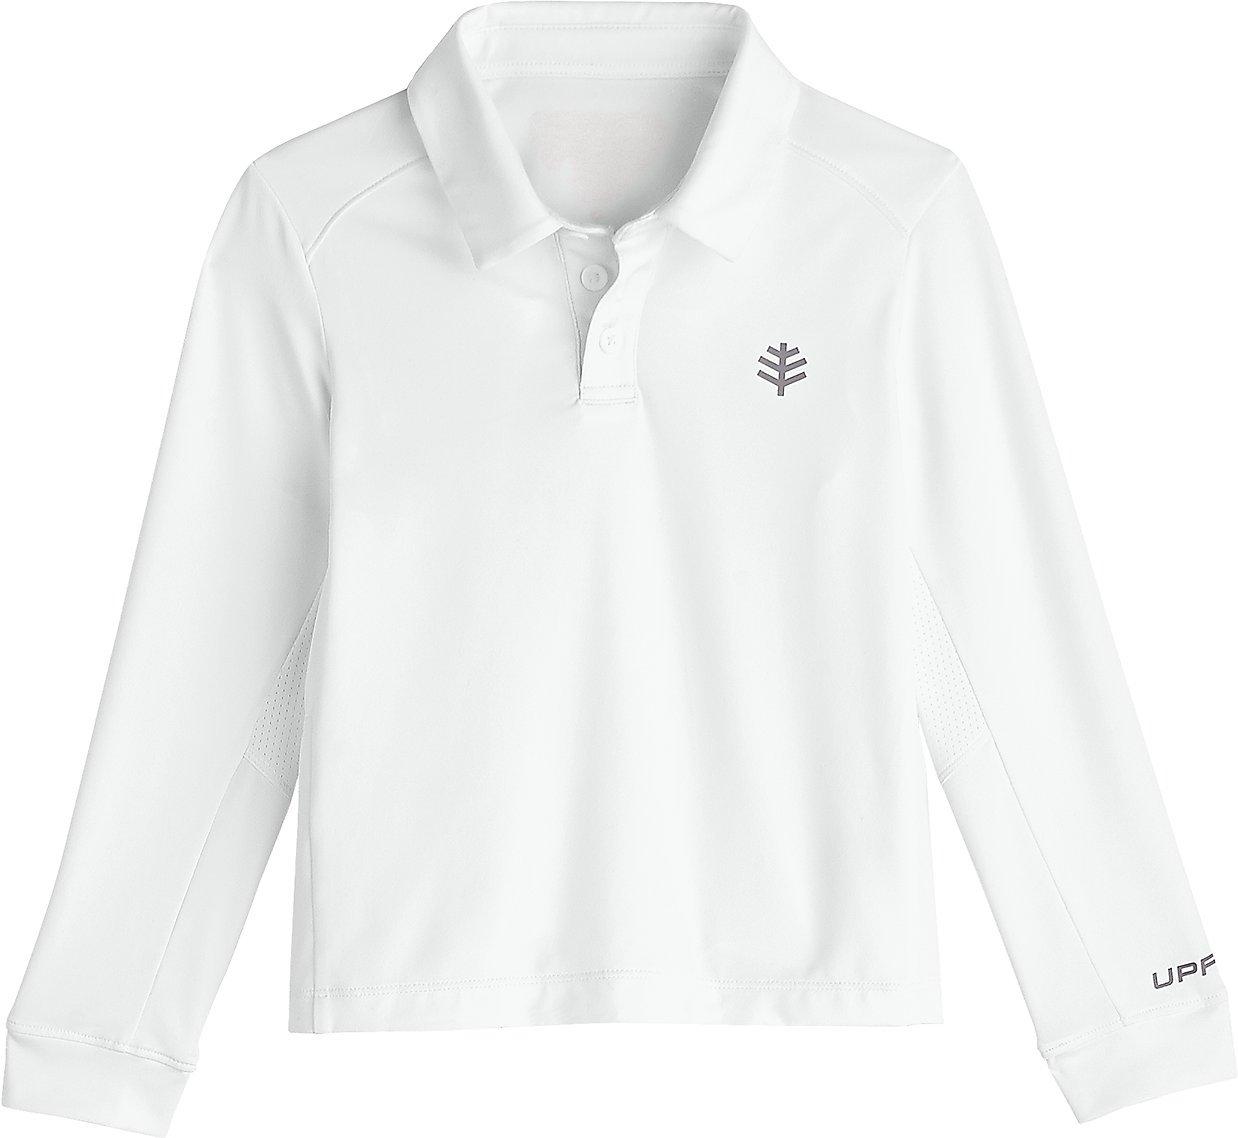 Coolibar UPF 50+ Boys' Long Sleeve Performance Polo - Sun Protective (Medium- White)